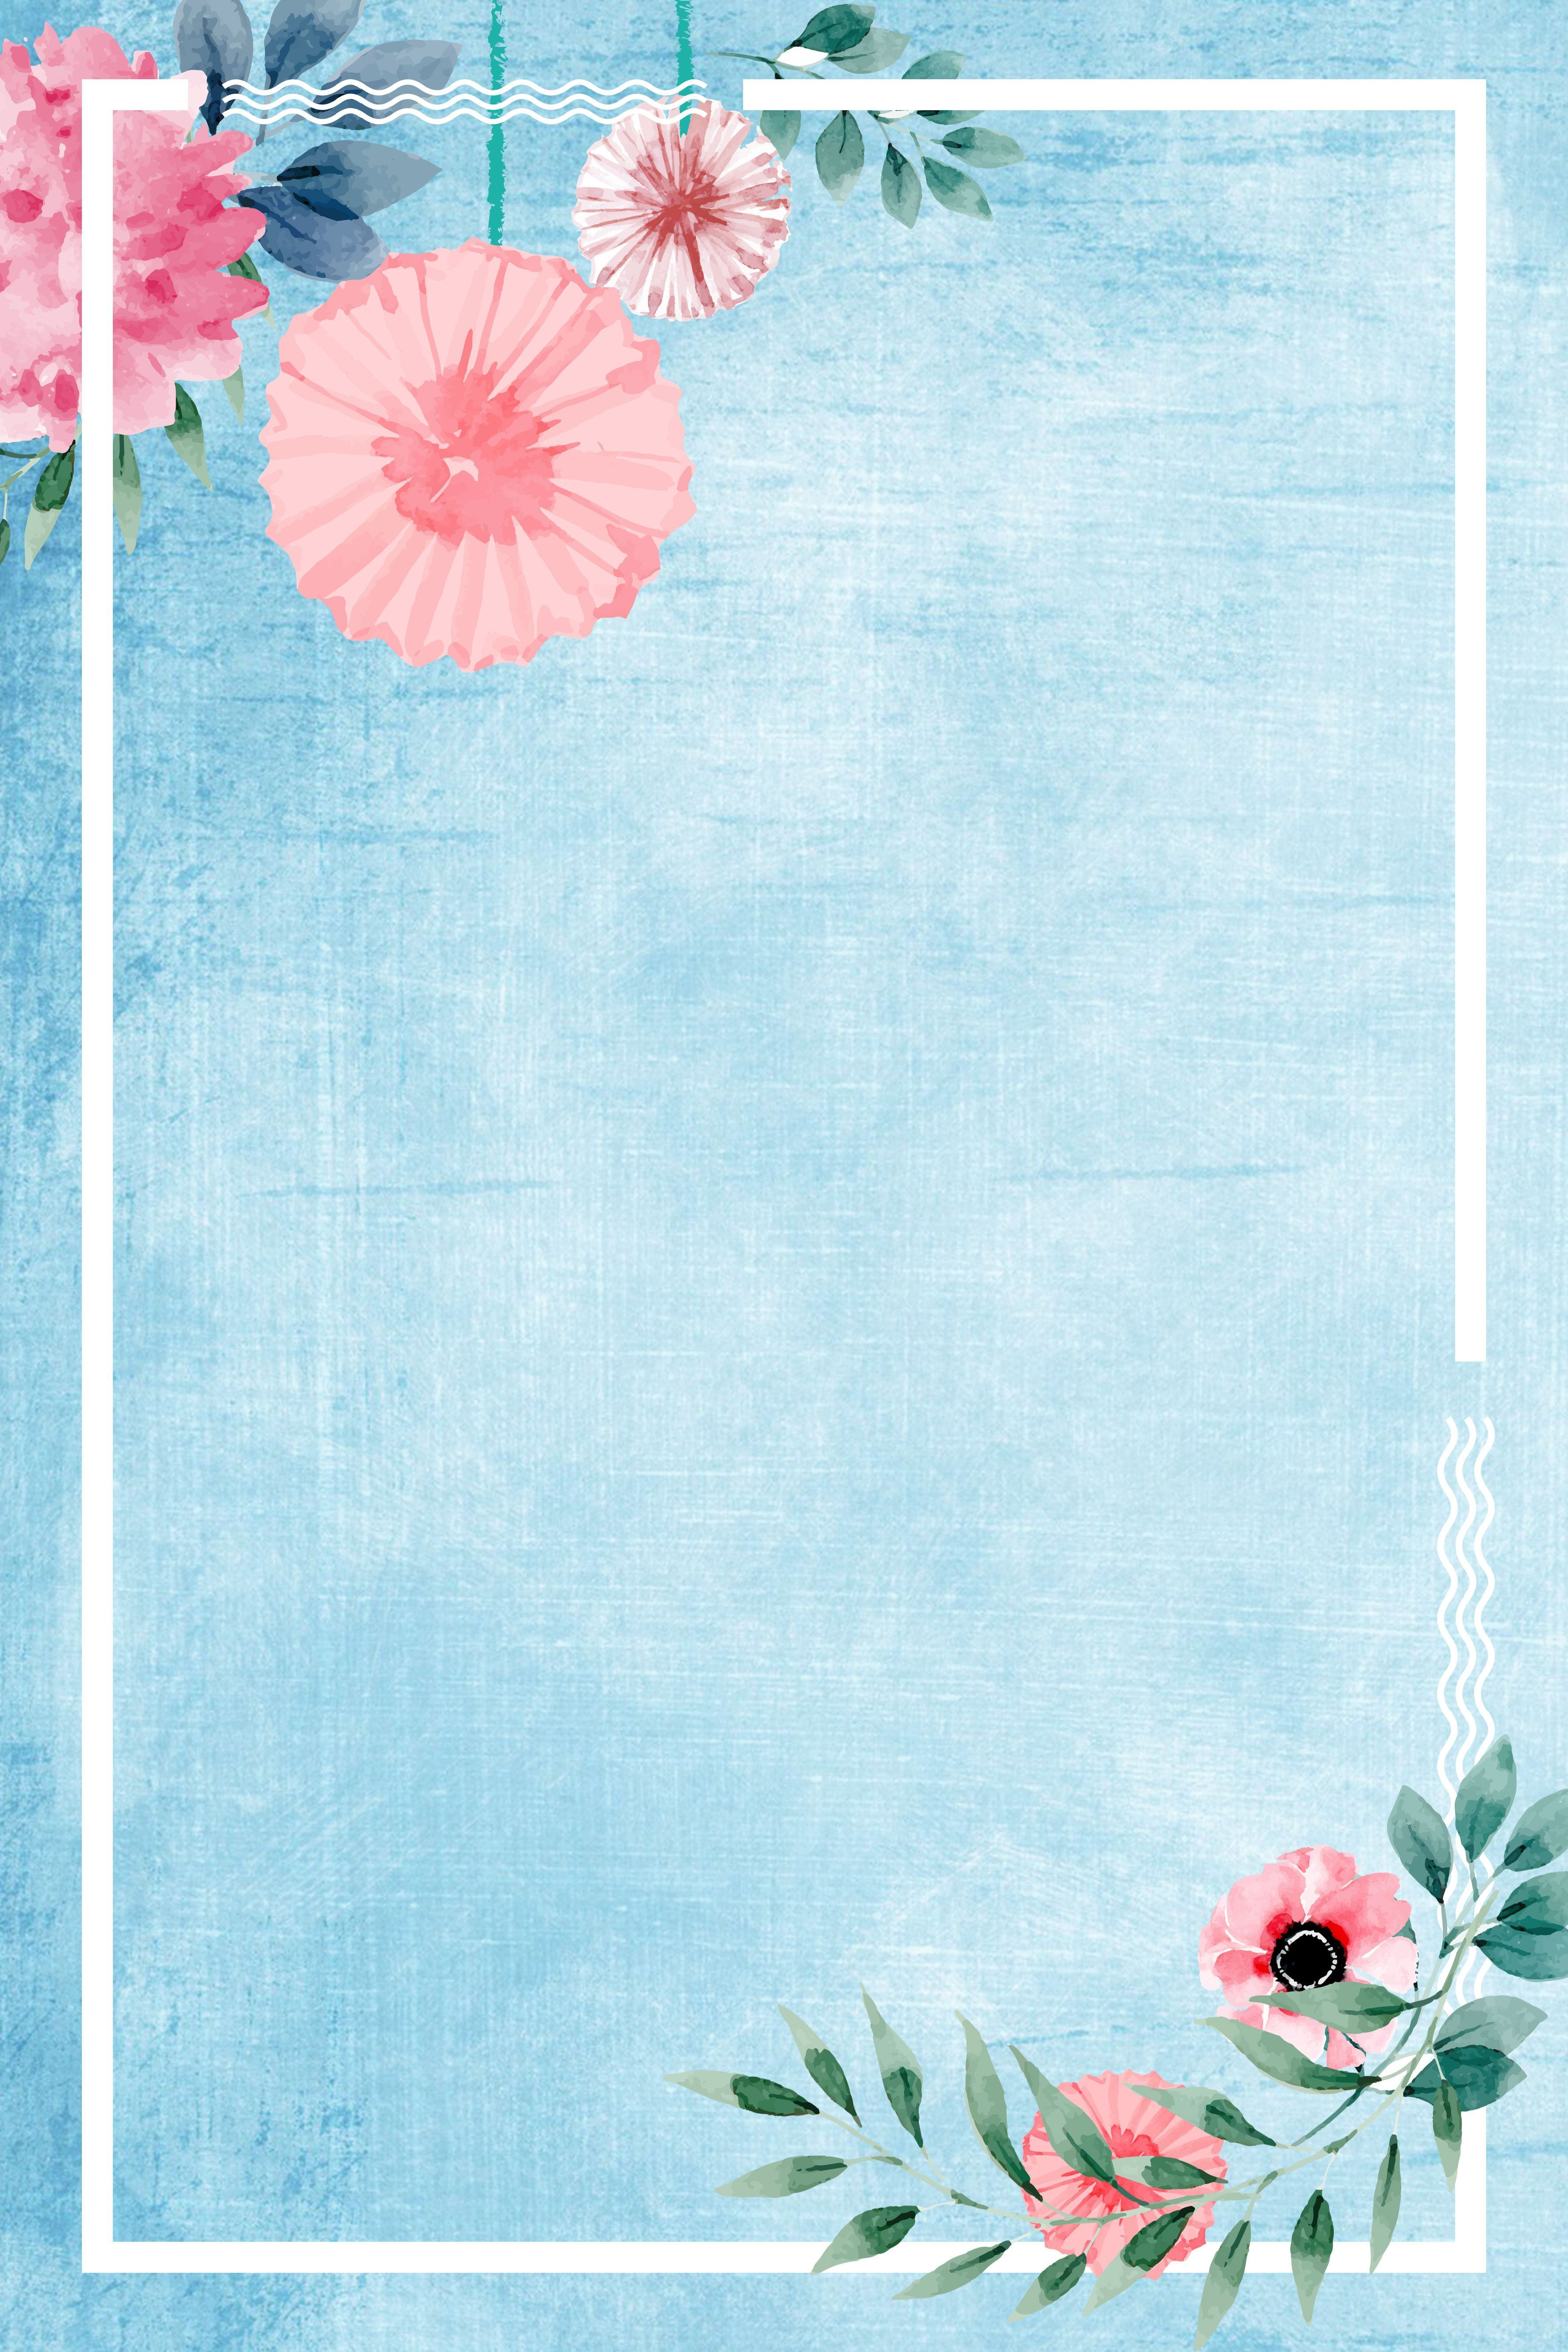 Letter Poster Background Flower Background Wallpaper Floral Poster Flower Backgrounds